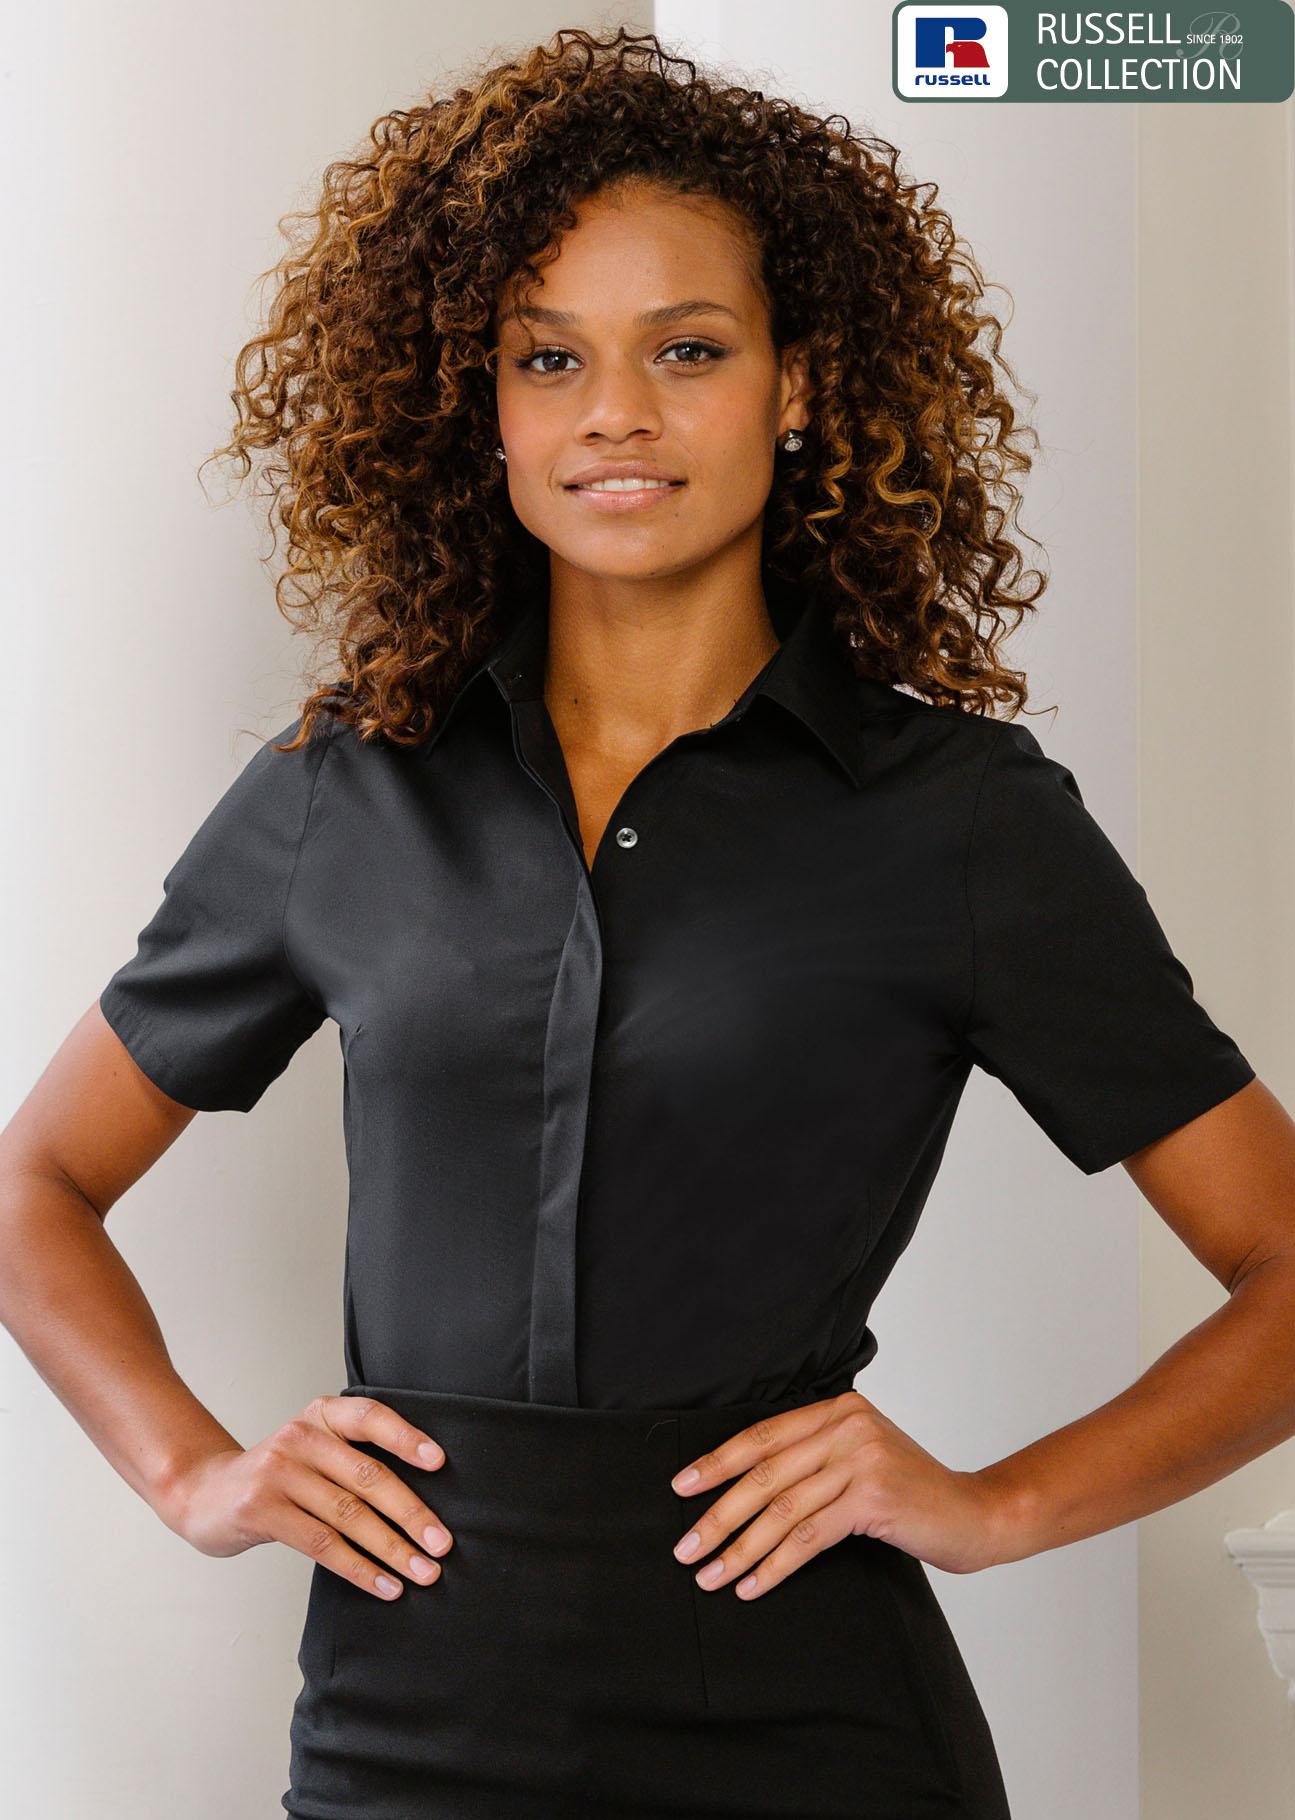 Russell, Damen Kurzarm Stretch Bluse, günstig besticken « Merkur ... 3f40f41227